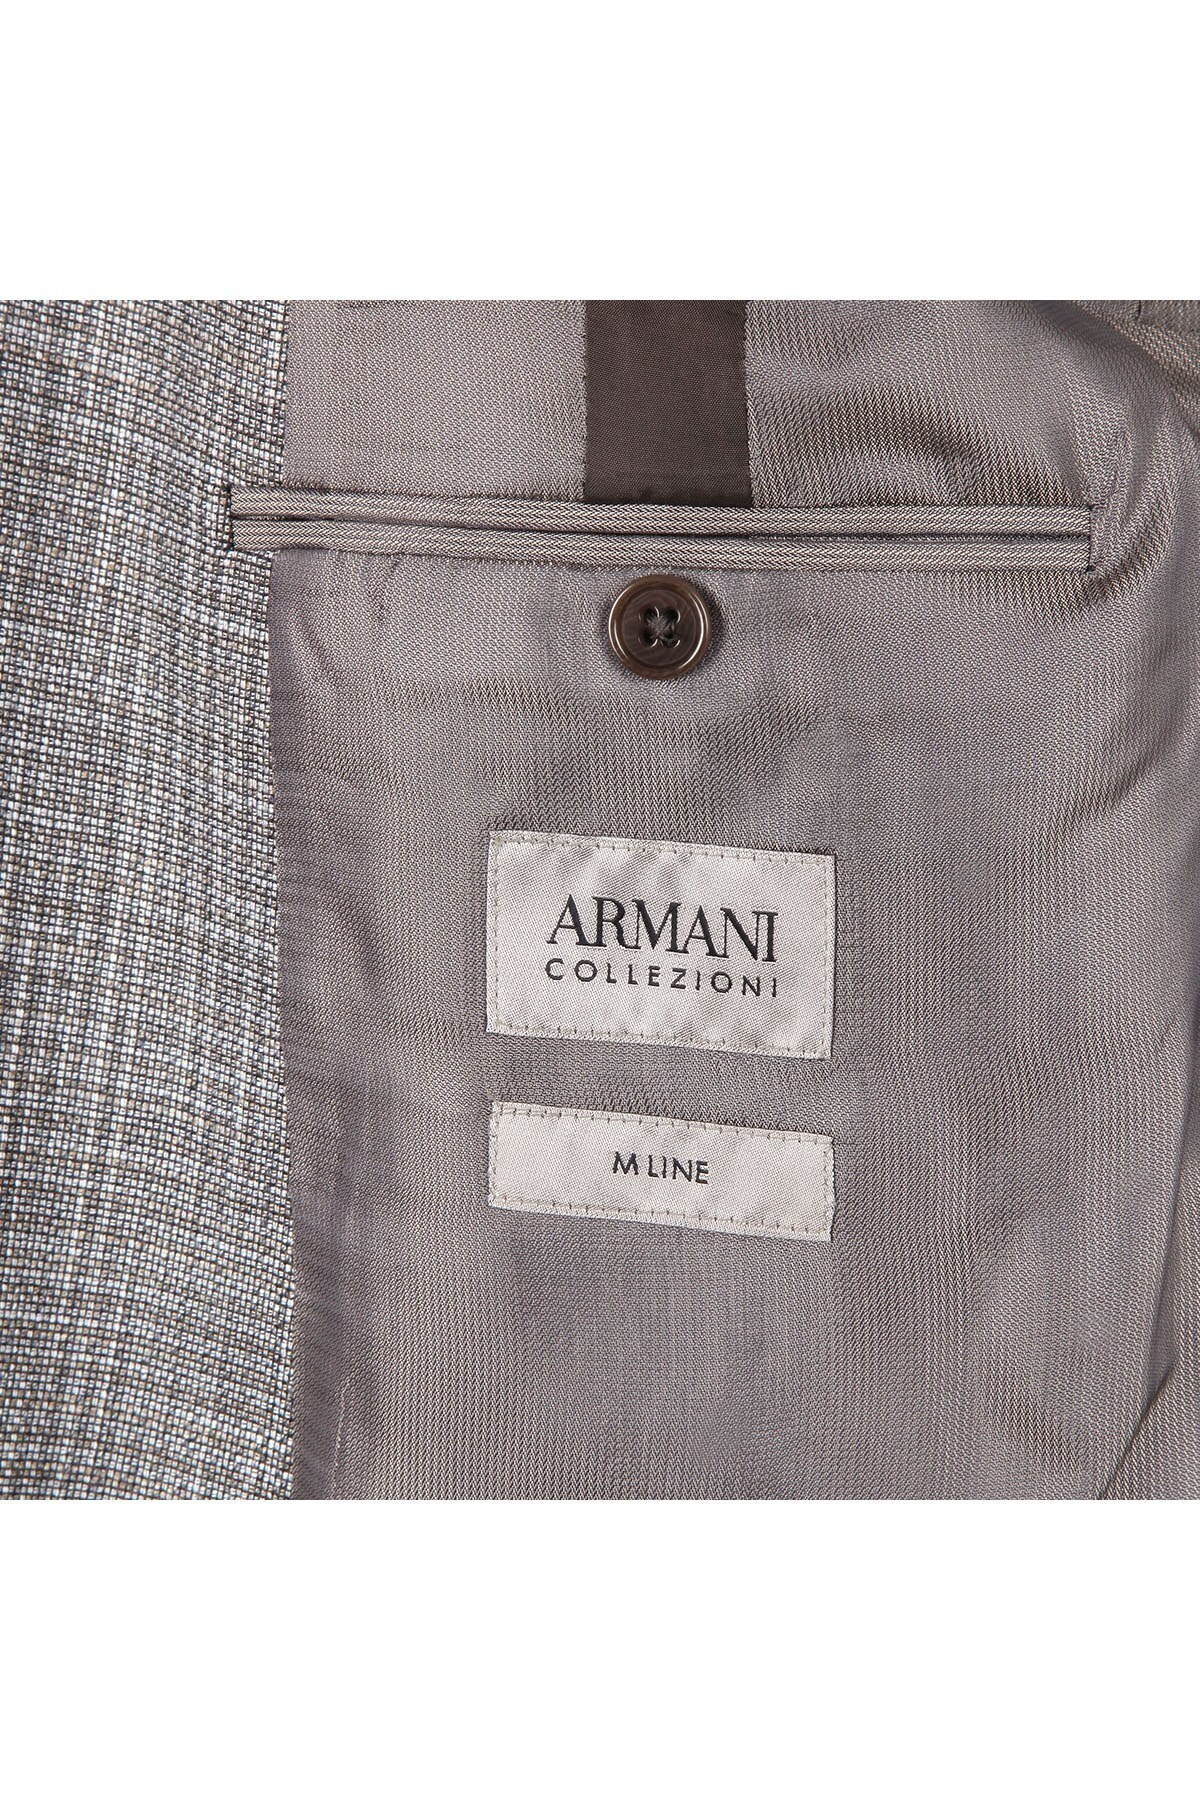 ARMANI COLLEZIONI Erkek Ceket VCGM30VC609